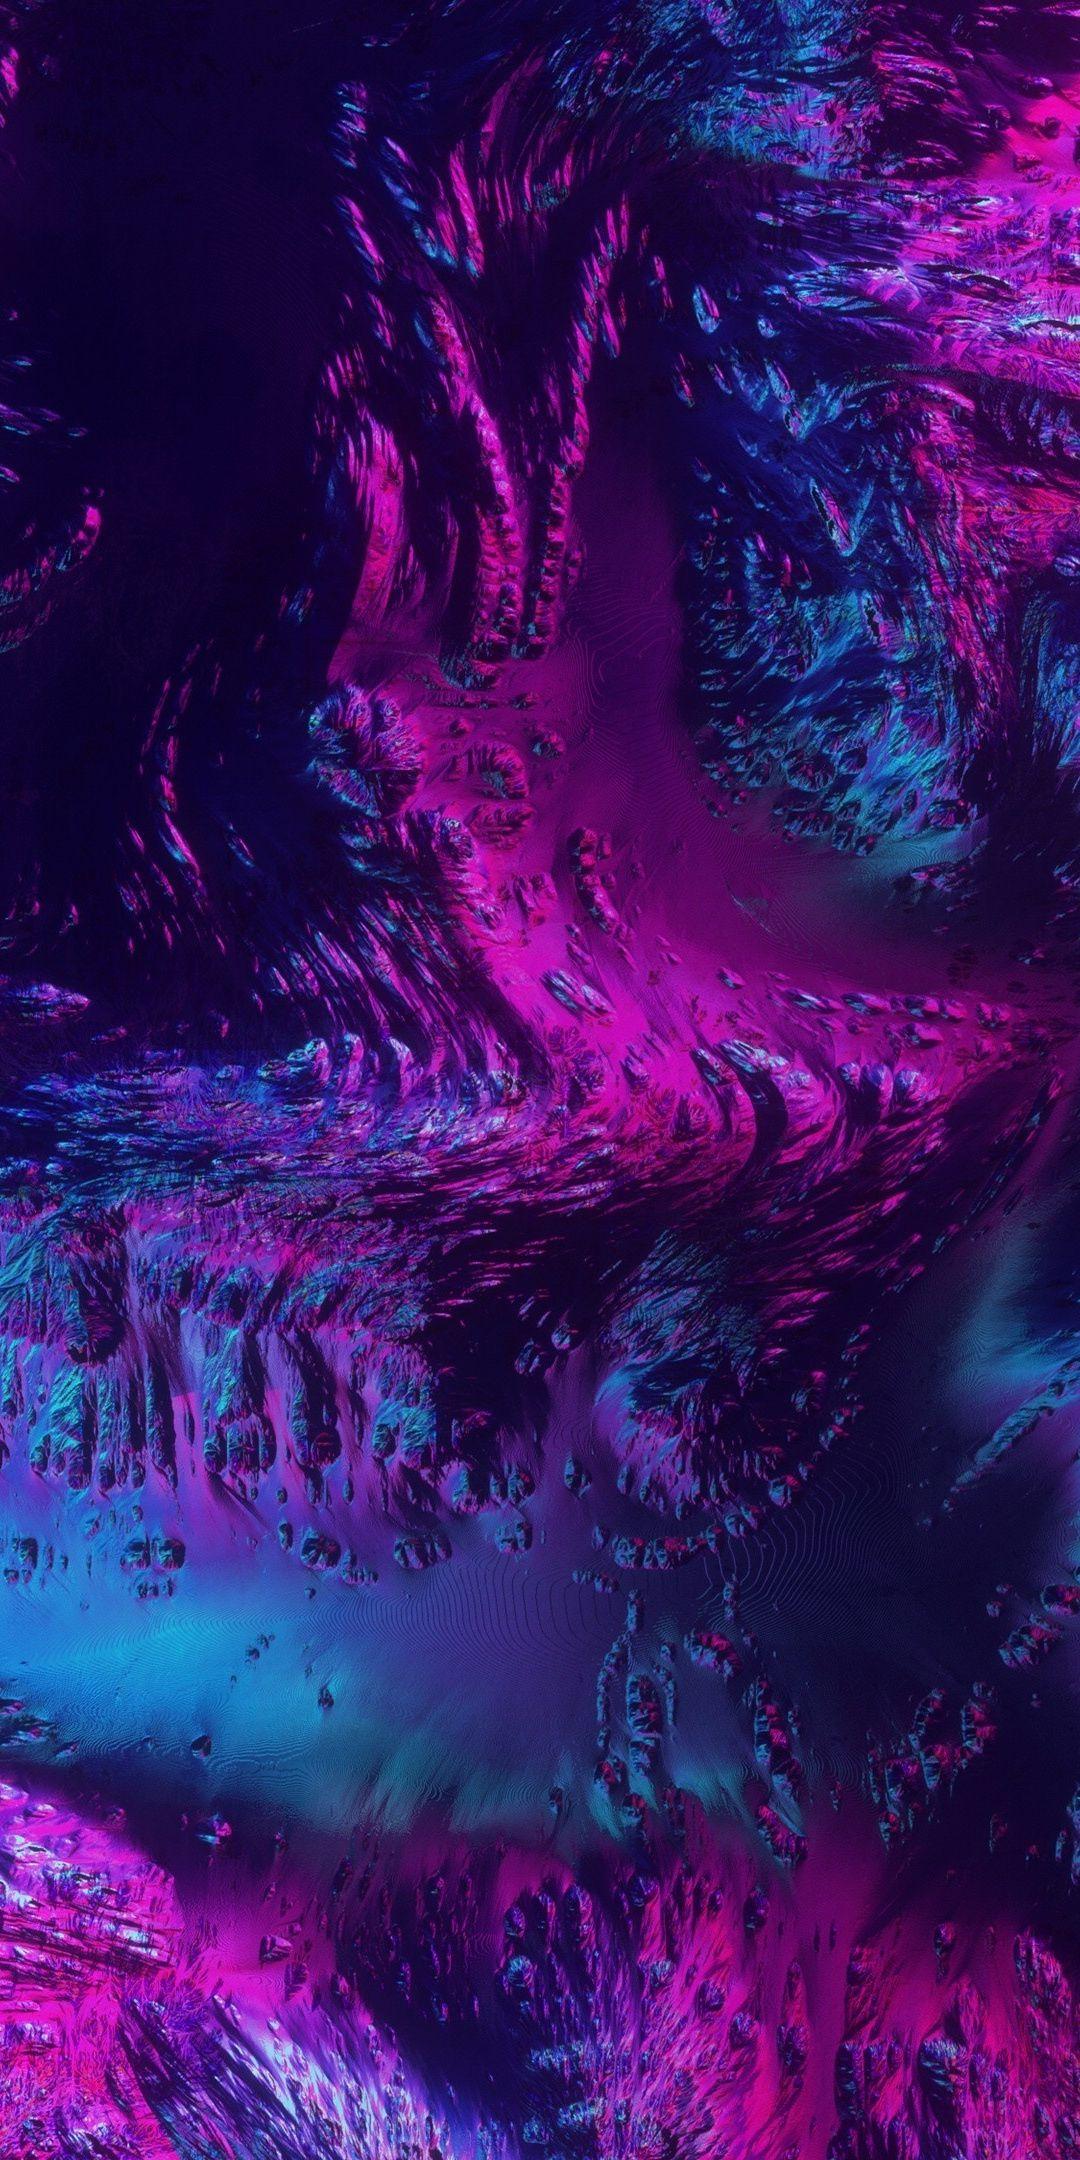 Neon, texture, abstract, dark, art, 1080x2160 wallpaper   Colors/Patterns in 2019   Pinterest ...